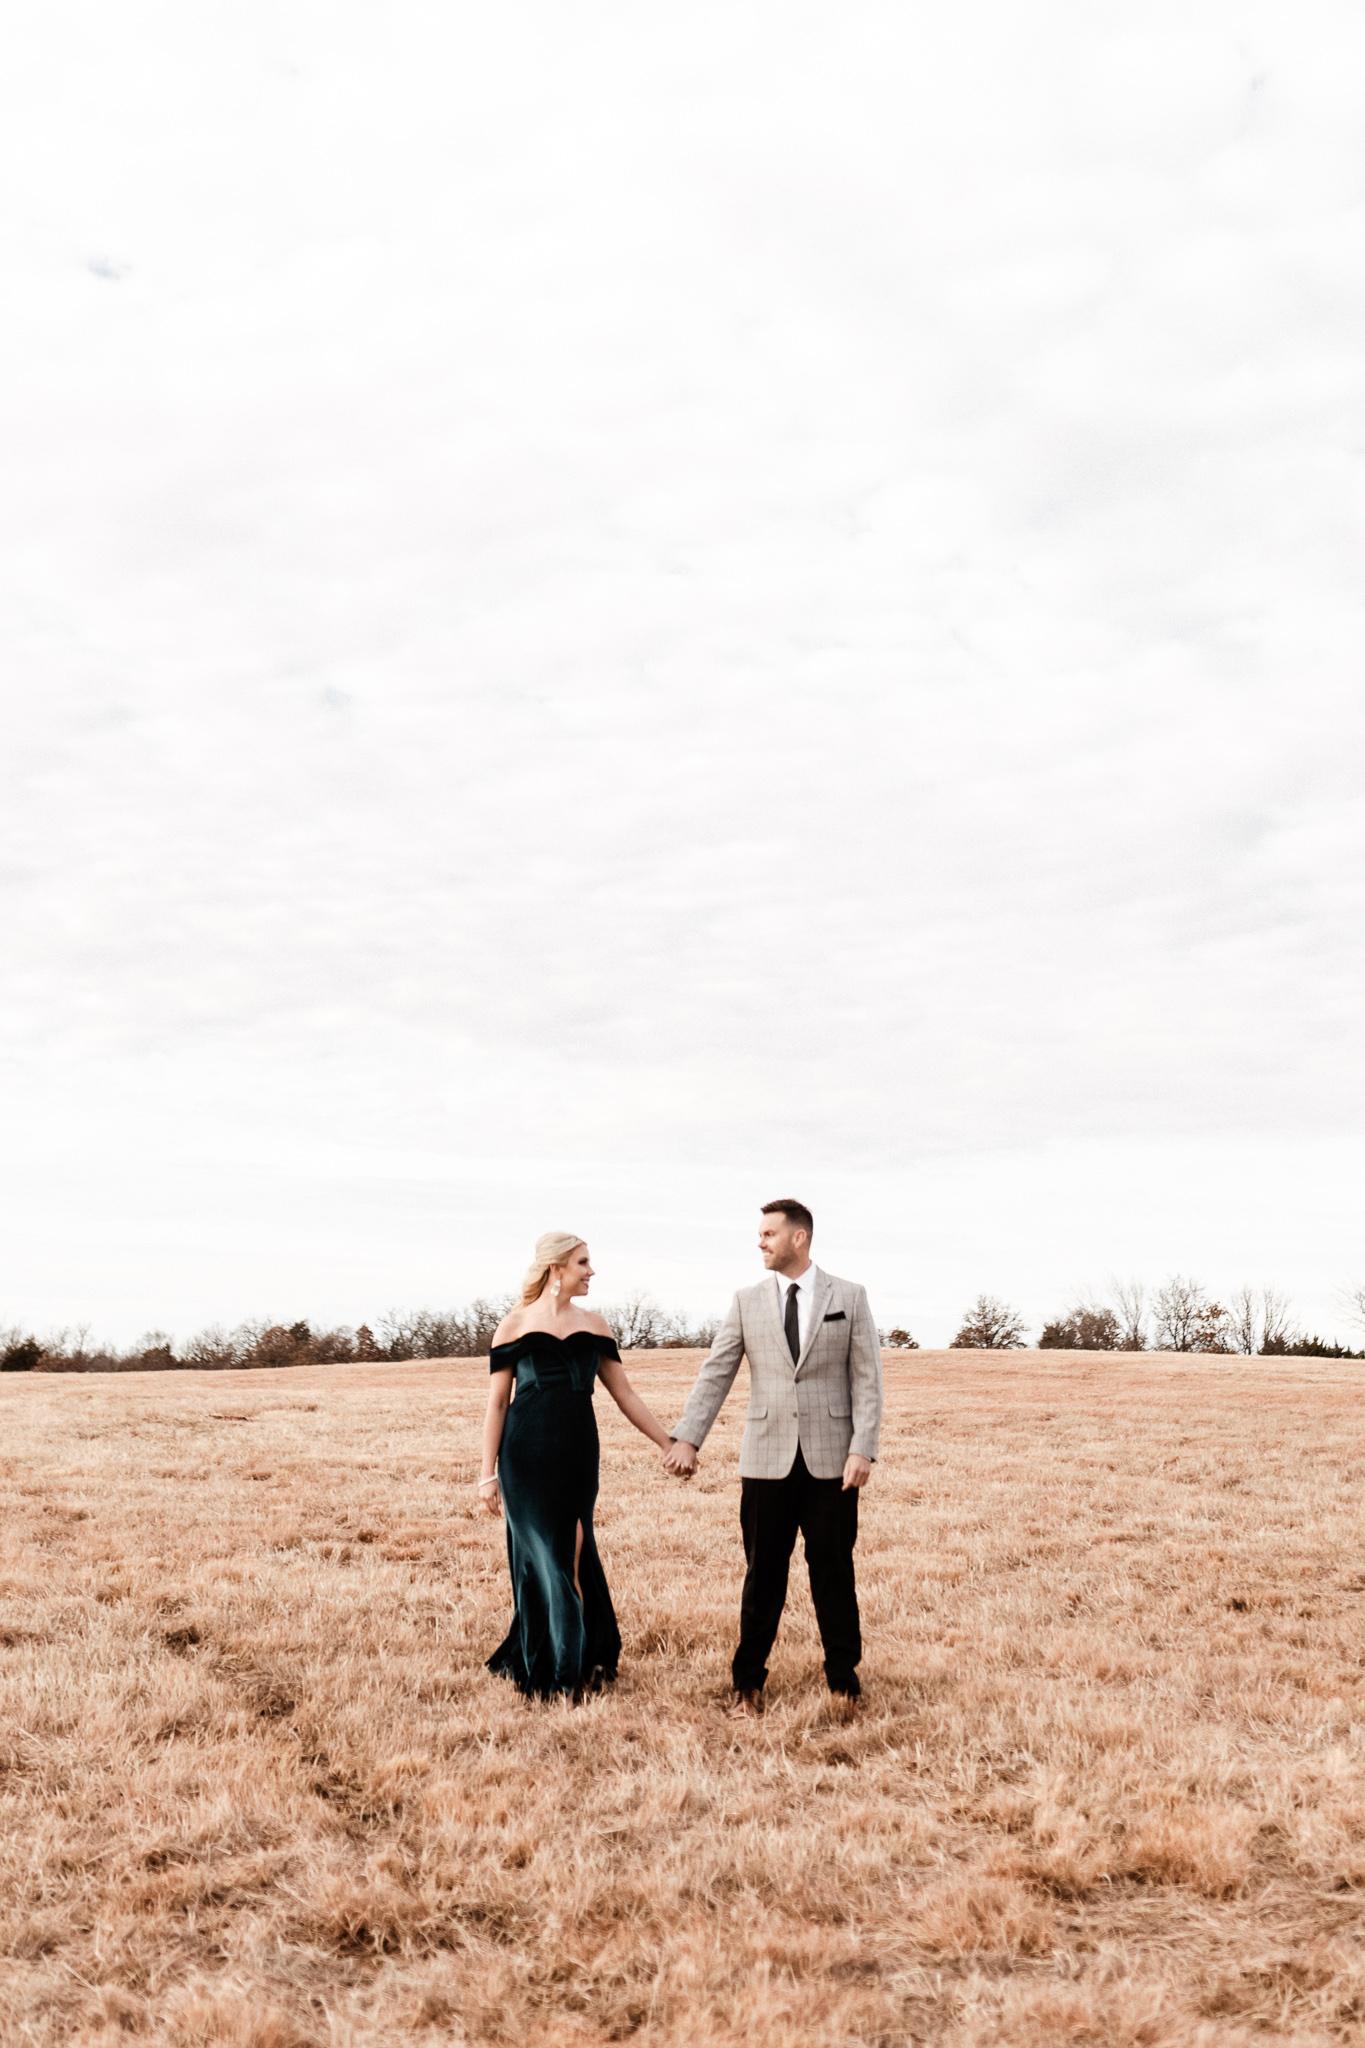 Wade + Stephanie | Warm Open Field Engagements | Oklahoma Wedding Photographer-1.jpg